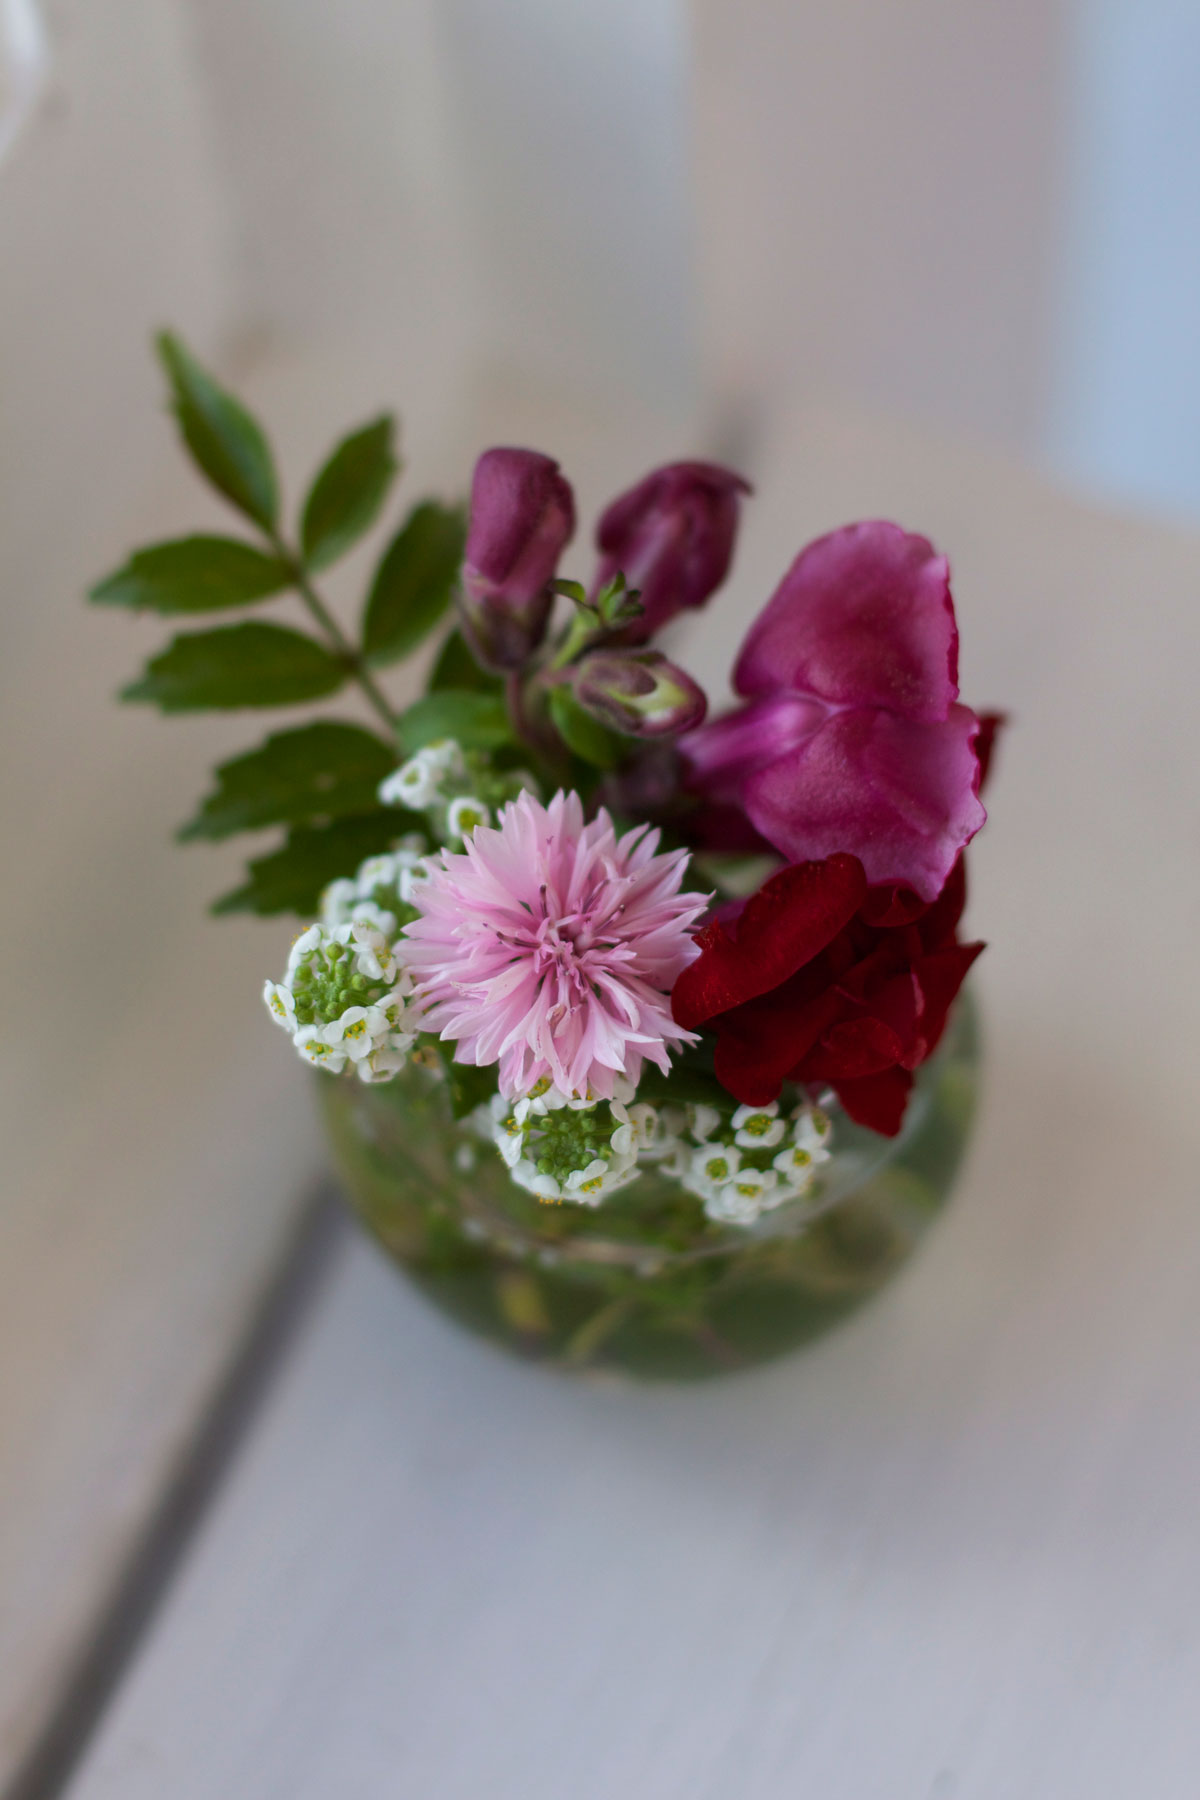 Flowers archives page 2 of 2 bit square diy mini summer flower arragements izmirmasajfo